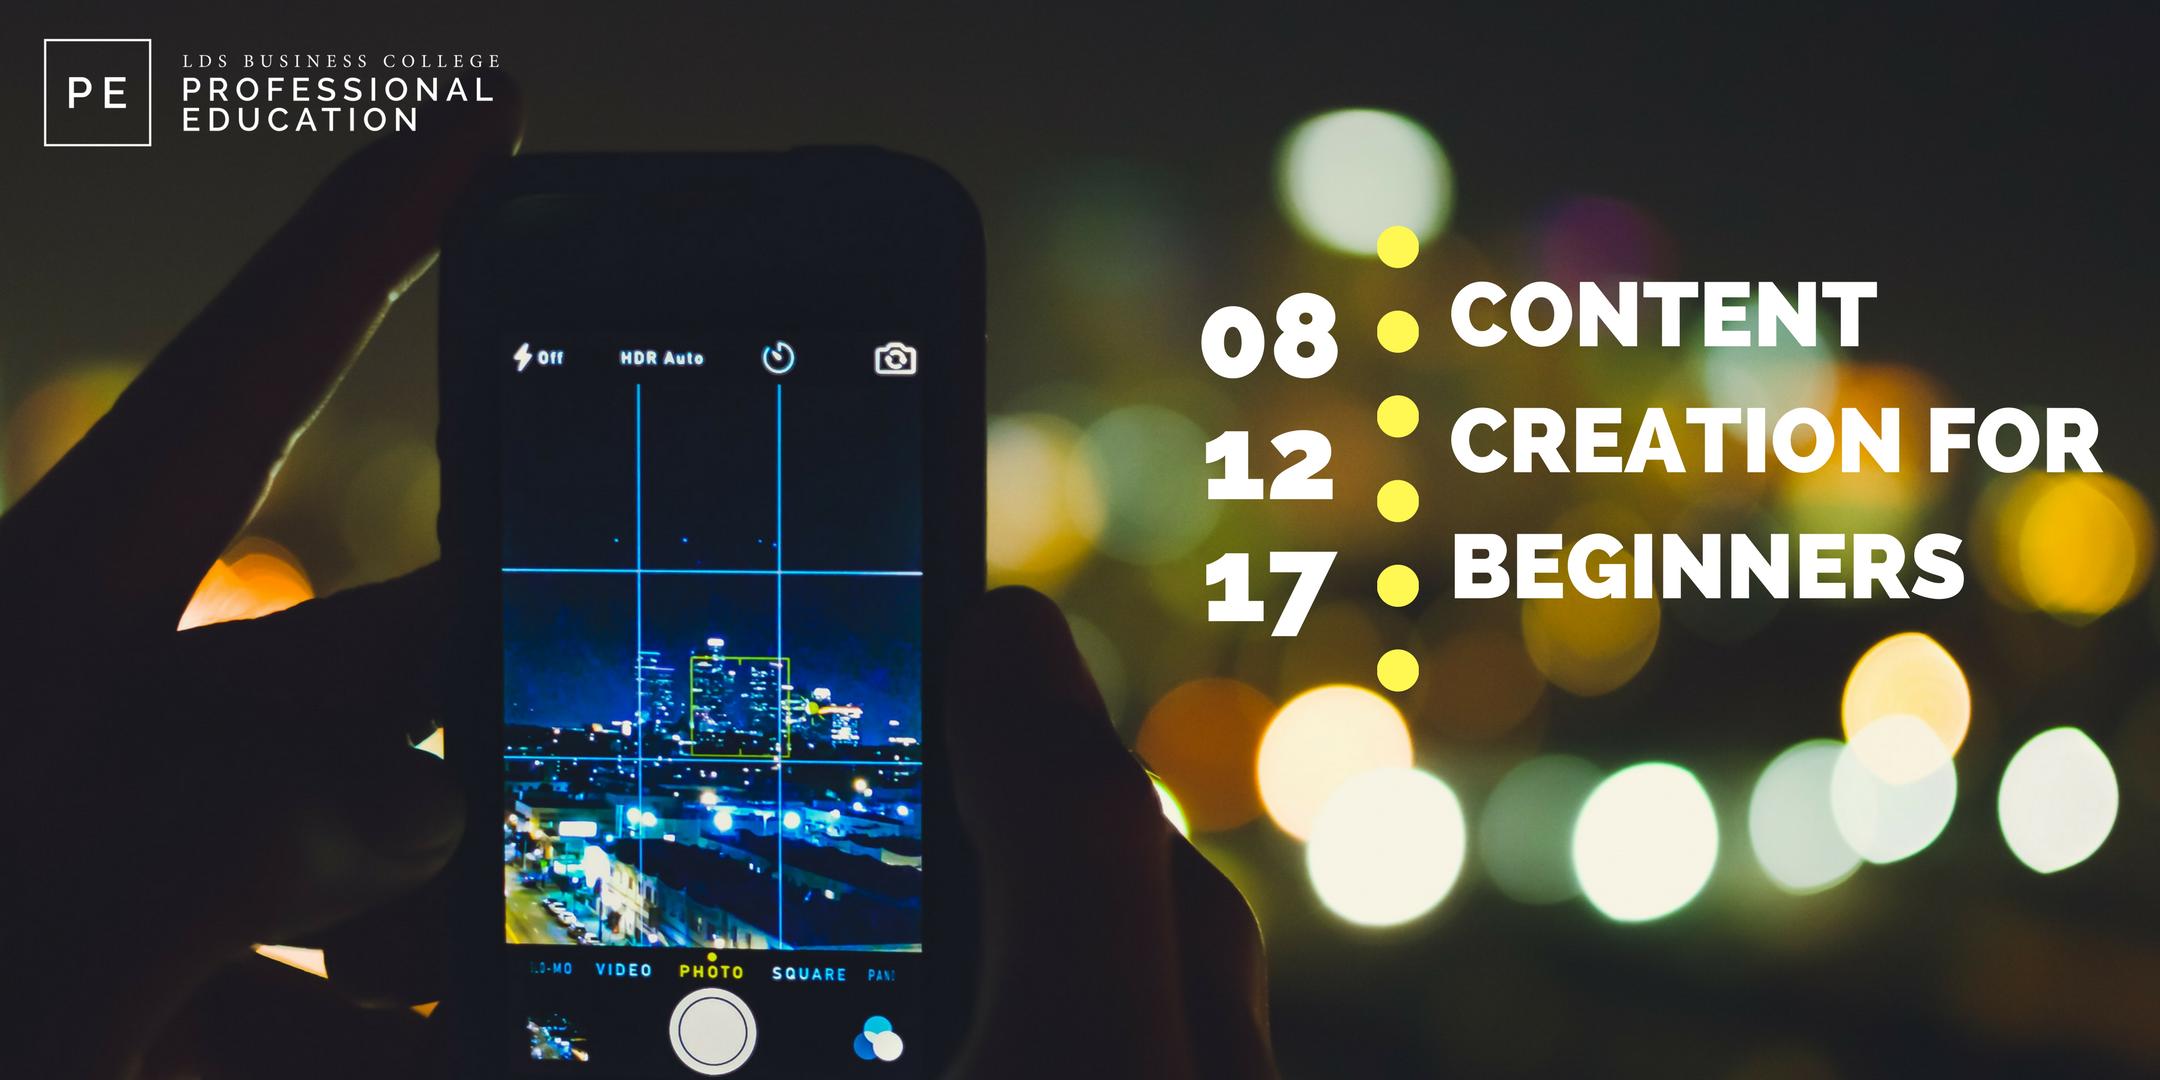 Digital Marketing: Content Creation for Begin